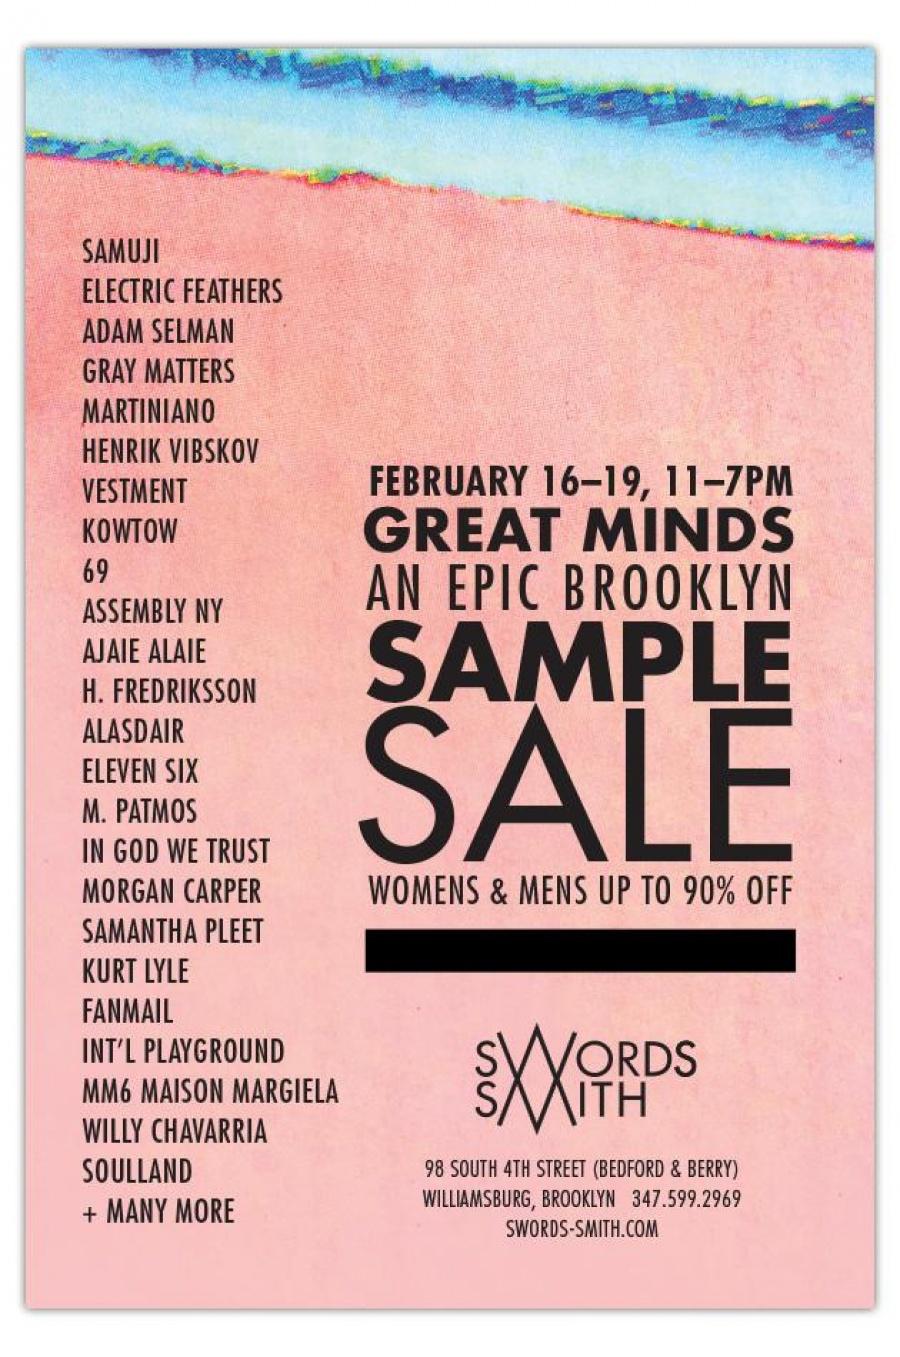 SWORDS-SMITH Great Minds Sample Sale